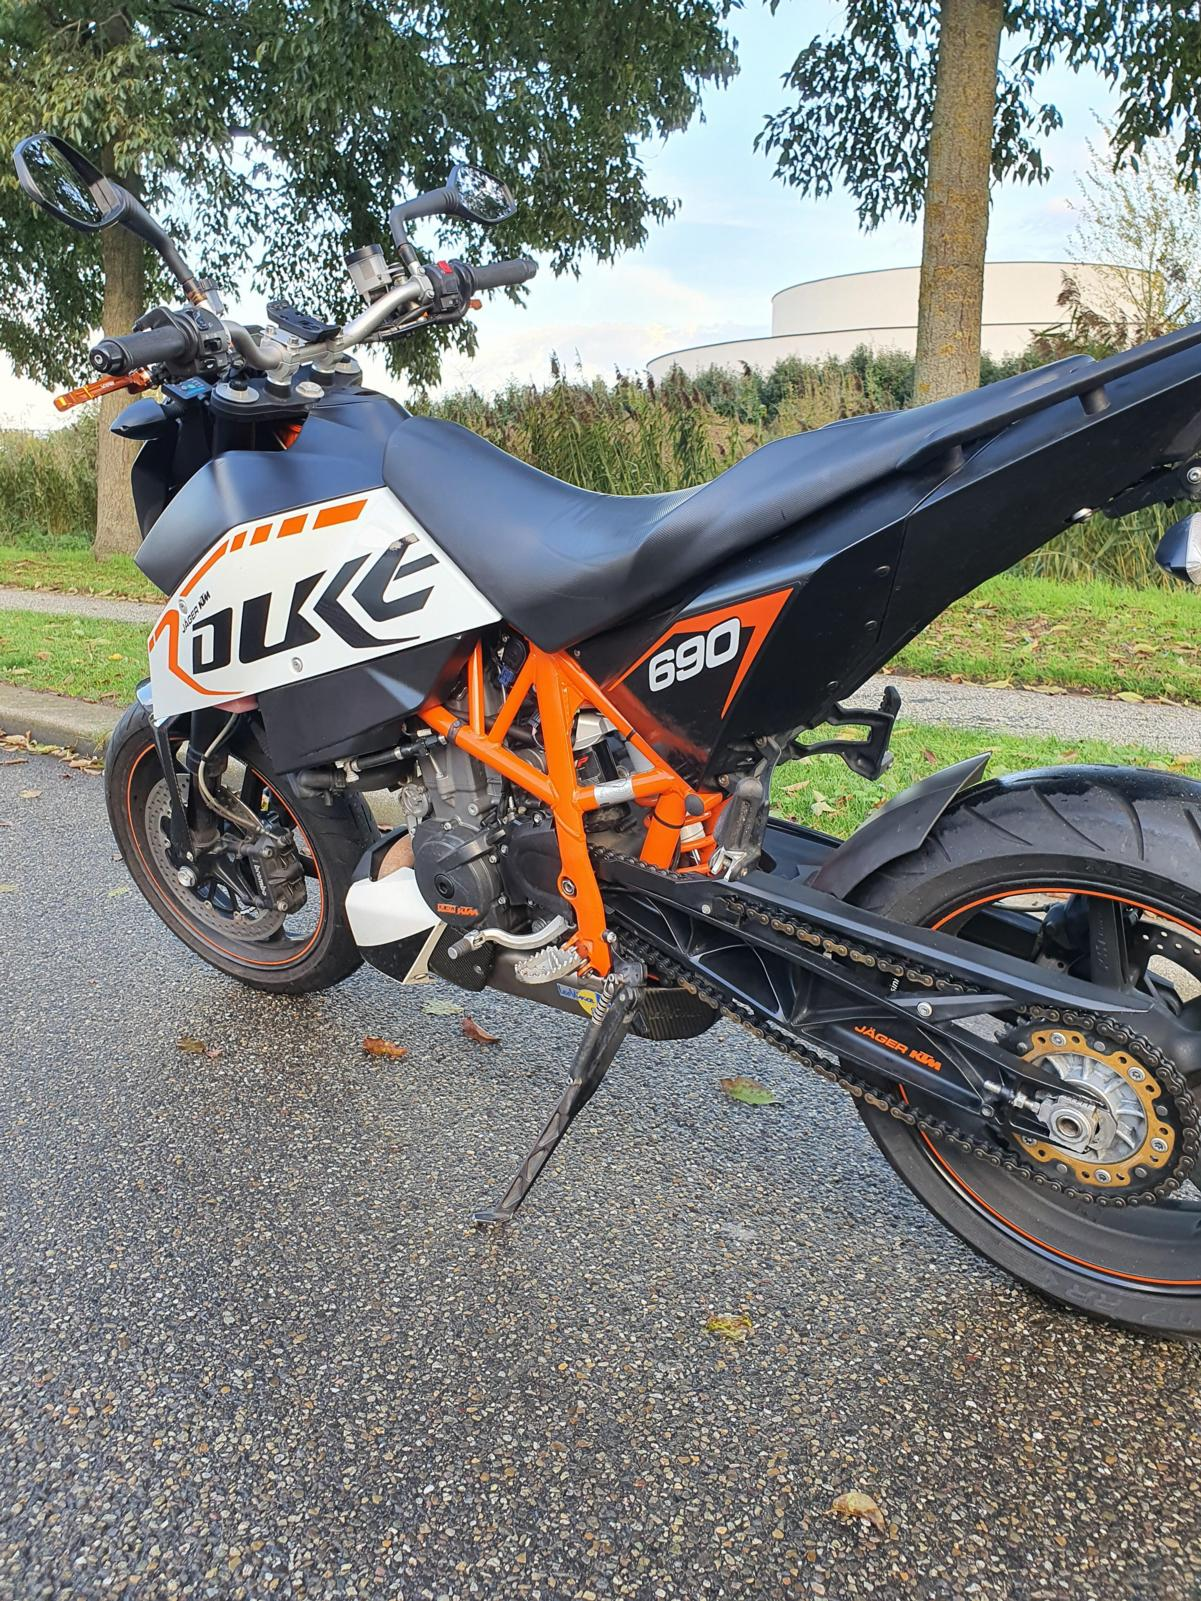 KTM - 690 DUKE R ABS